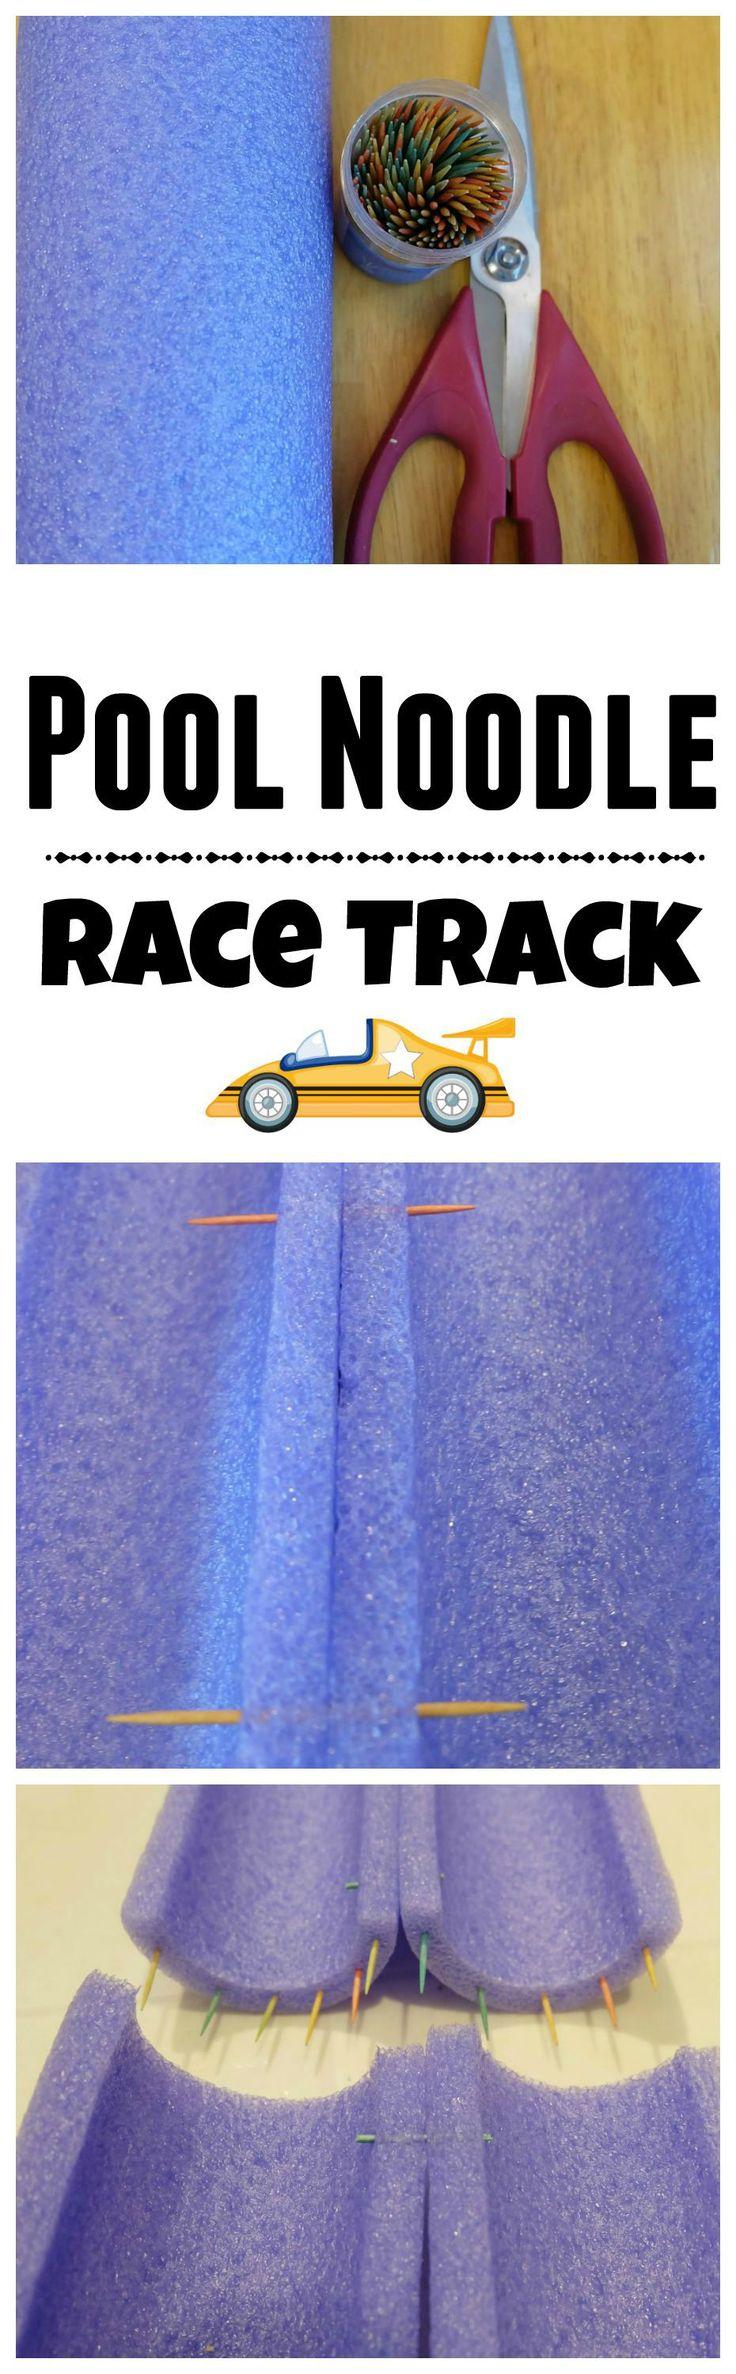 Pool Noodle Race Track